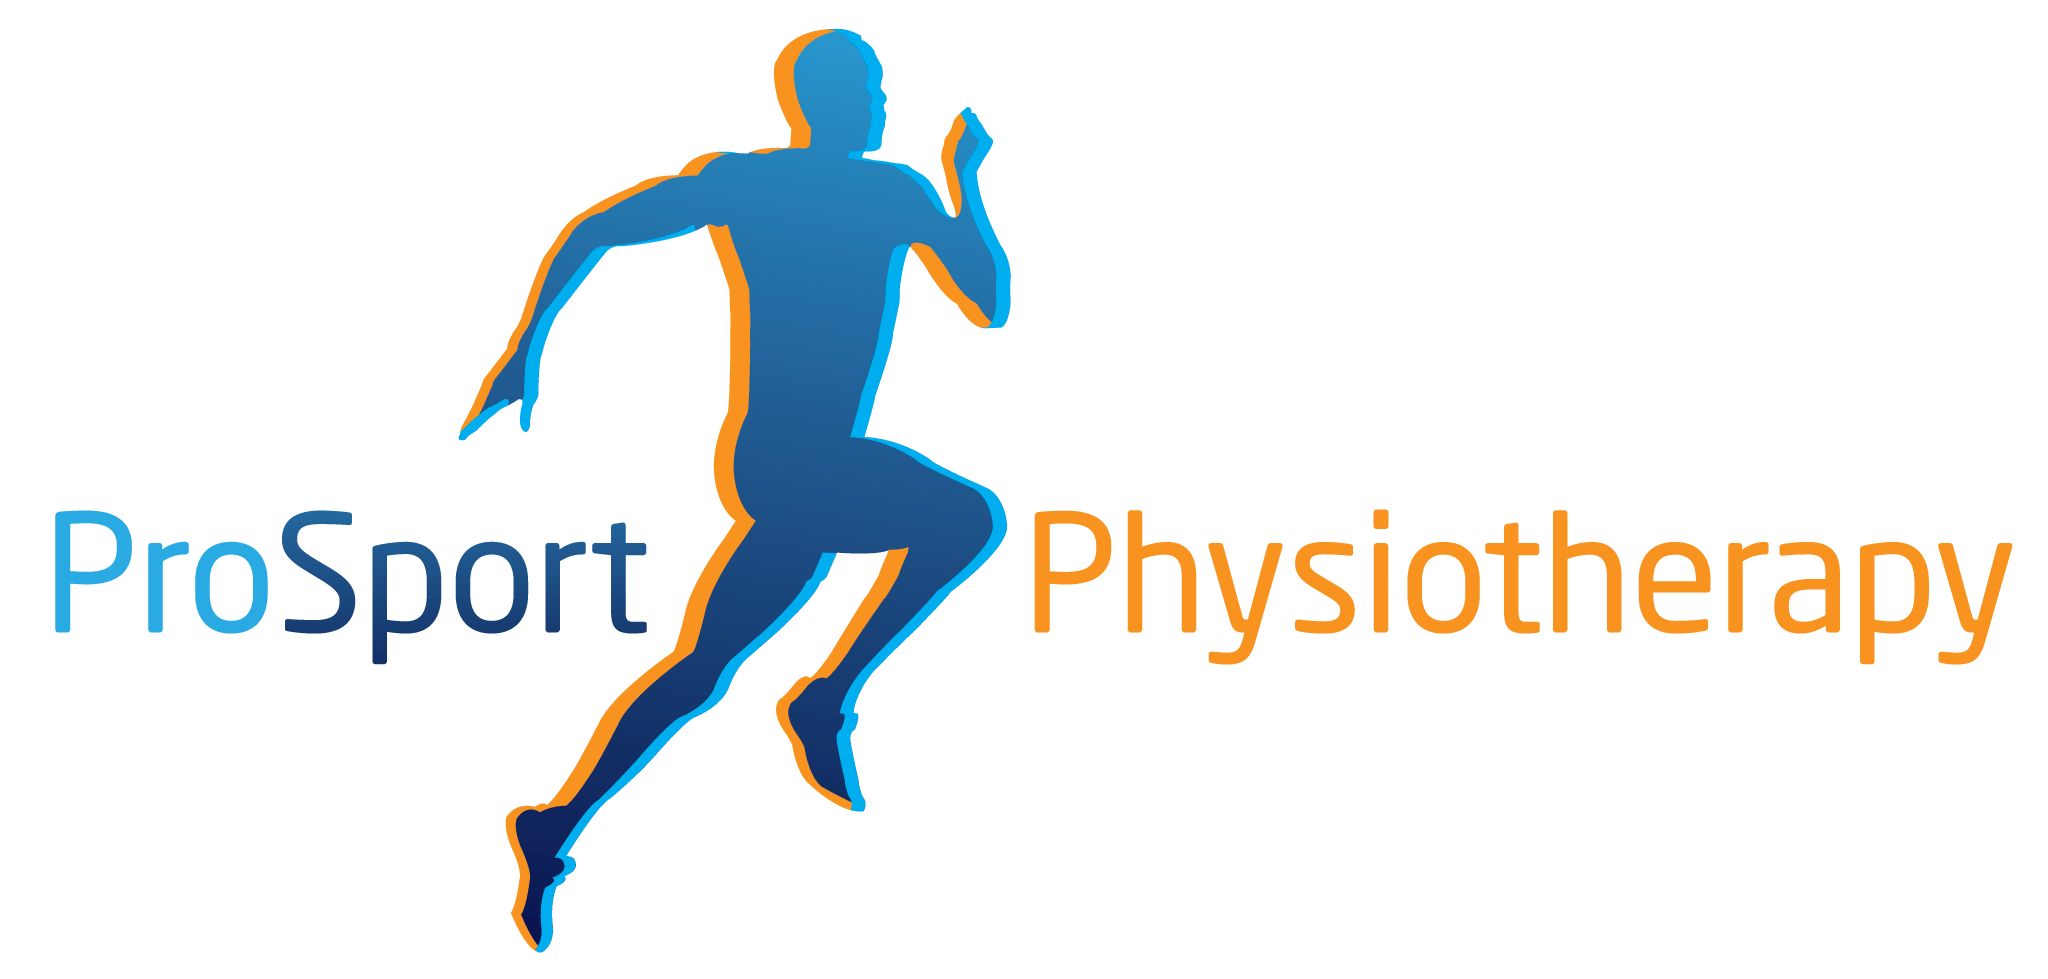 prosport-physiotherapy-logo